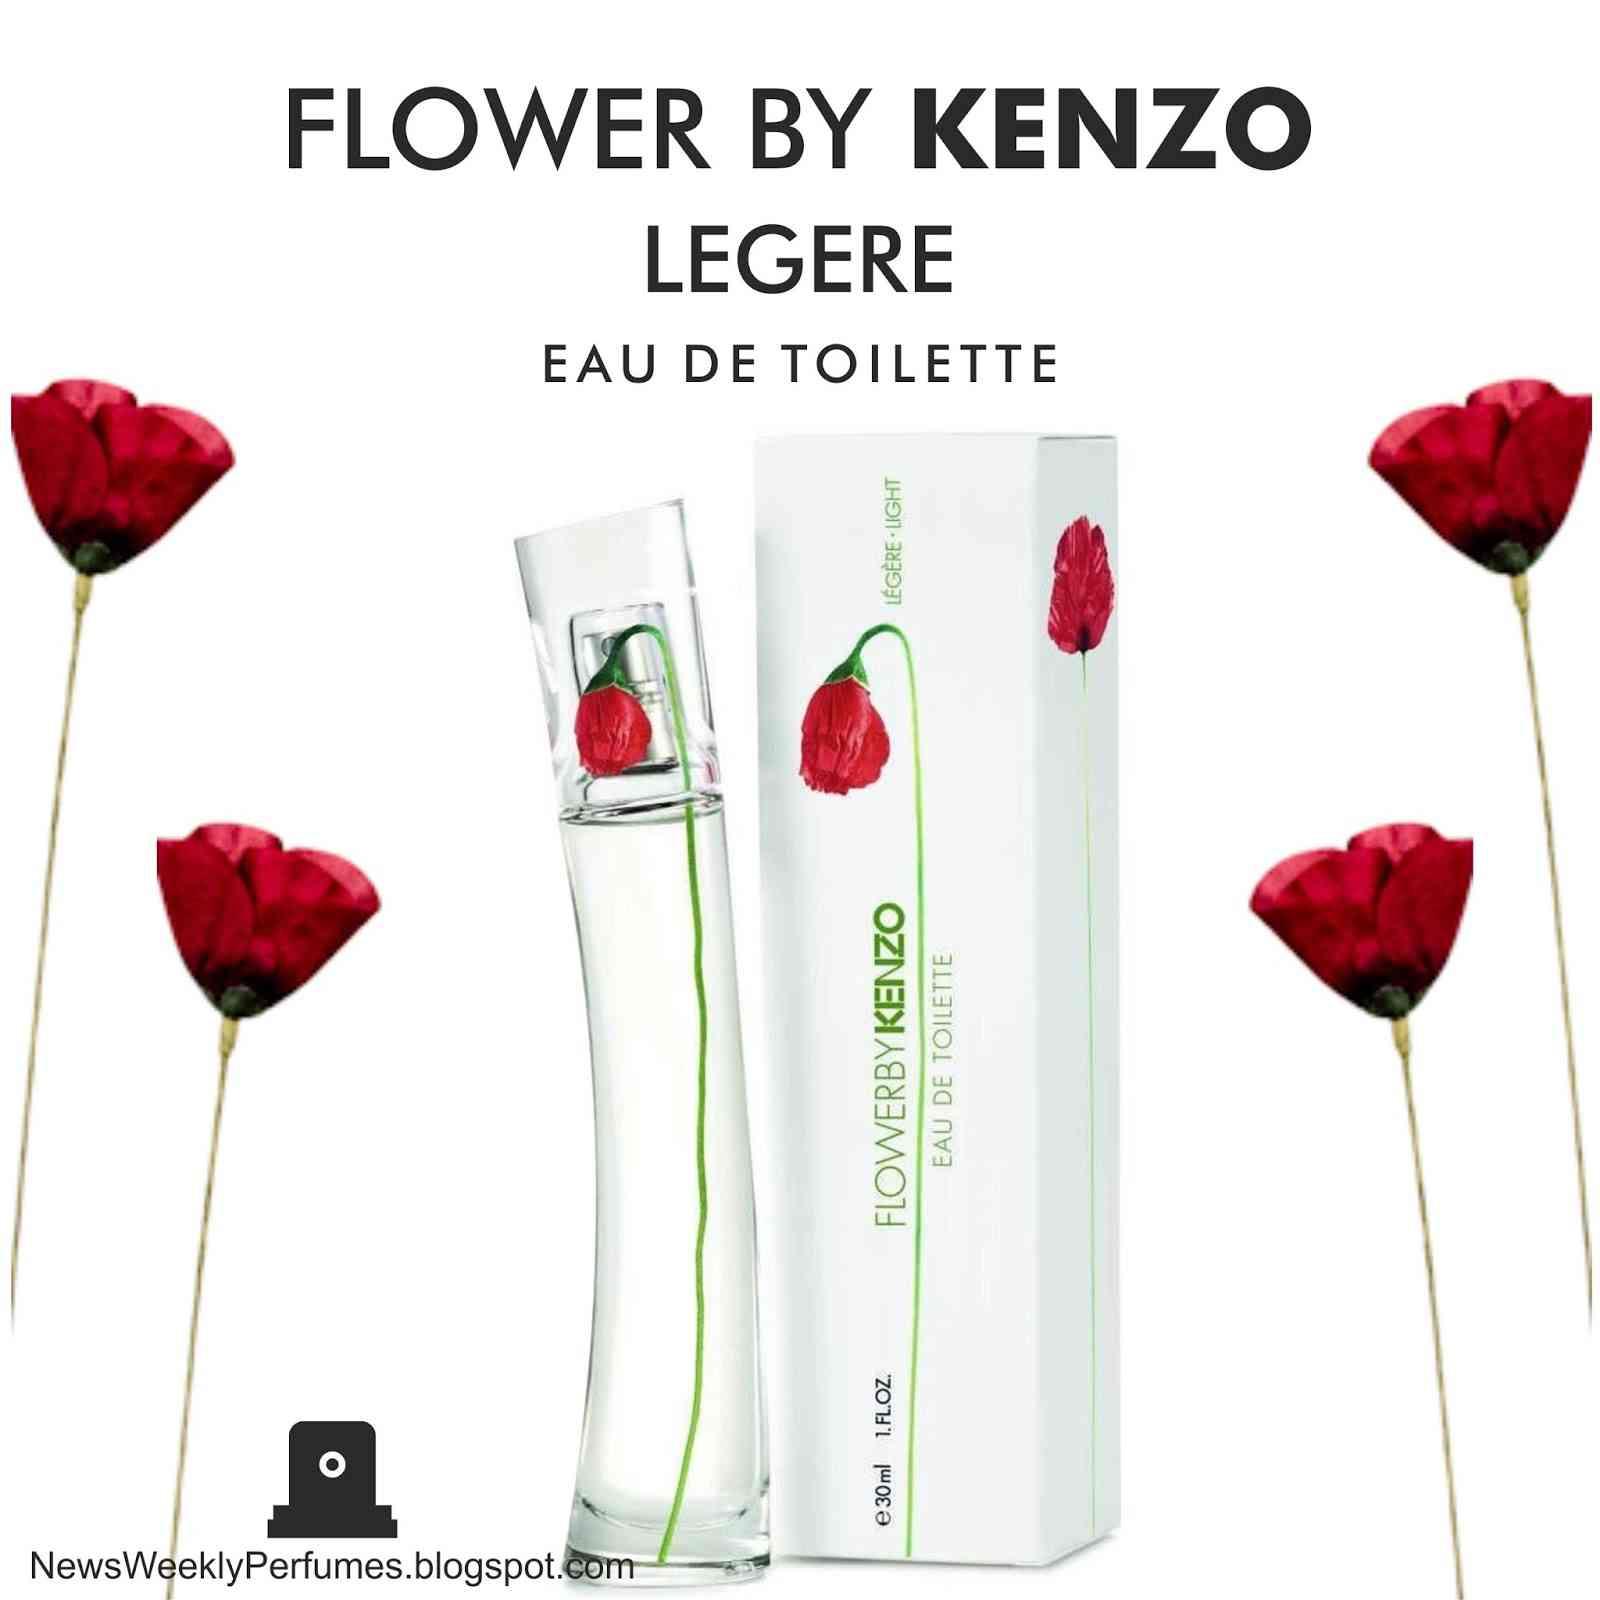 Flower by Kenzo-parfum